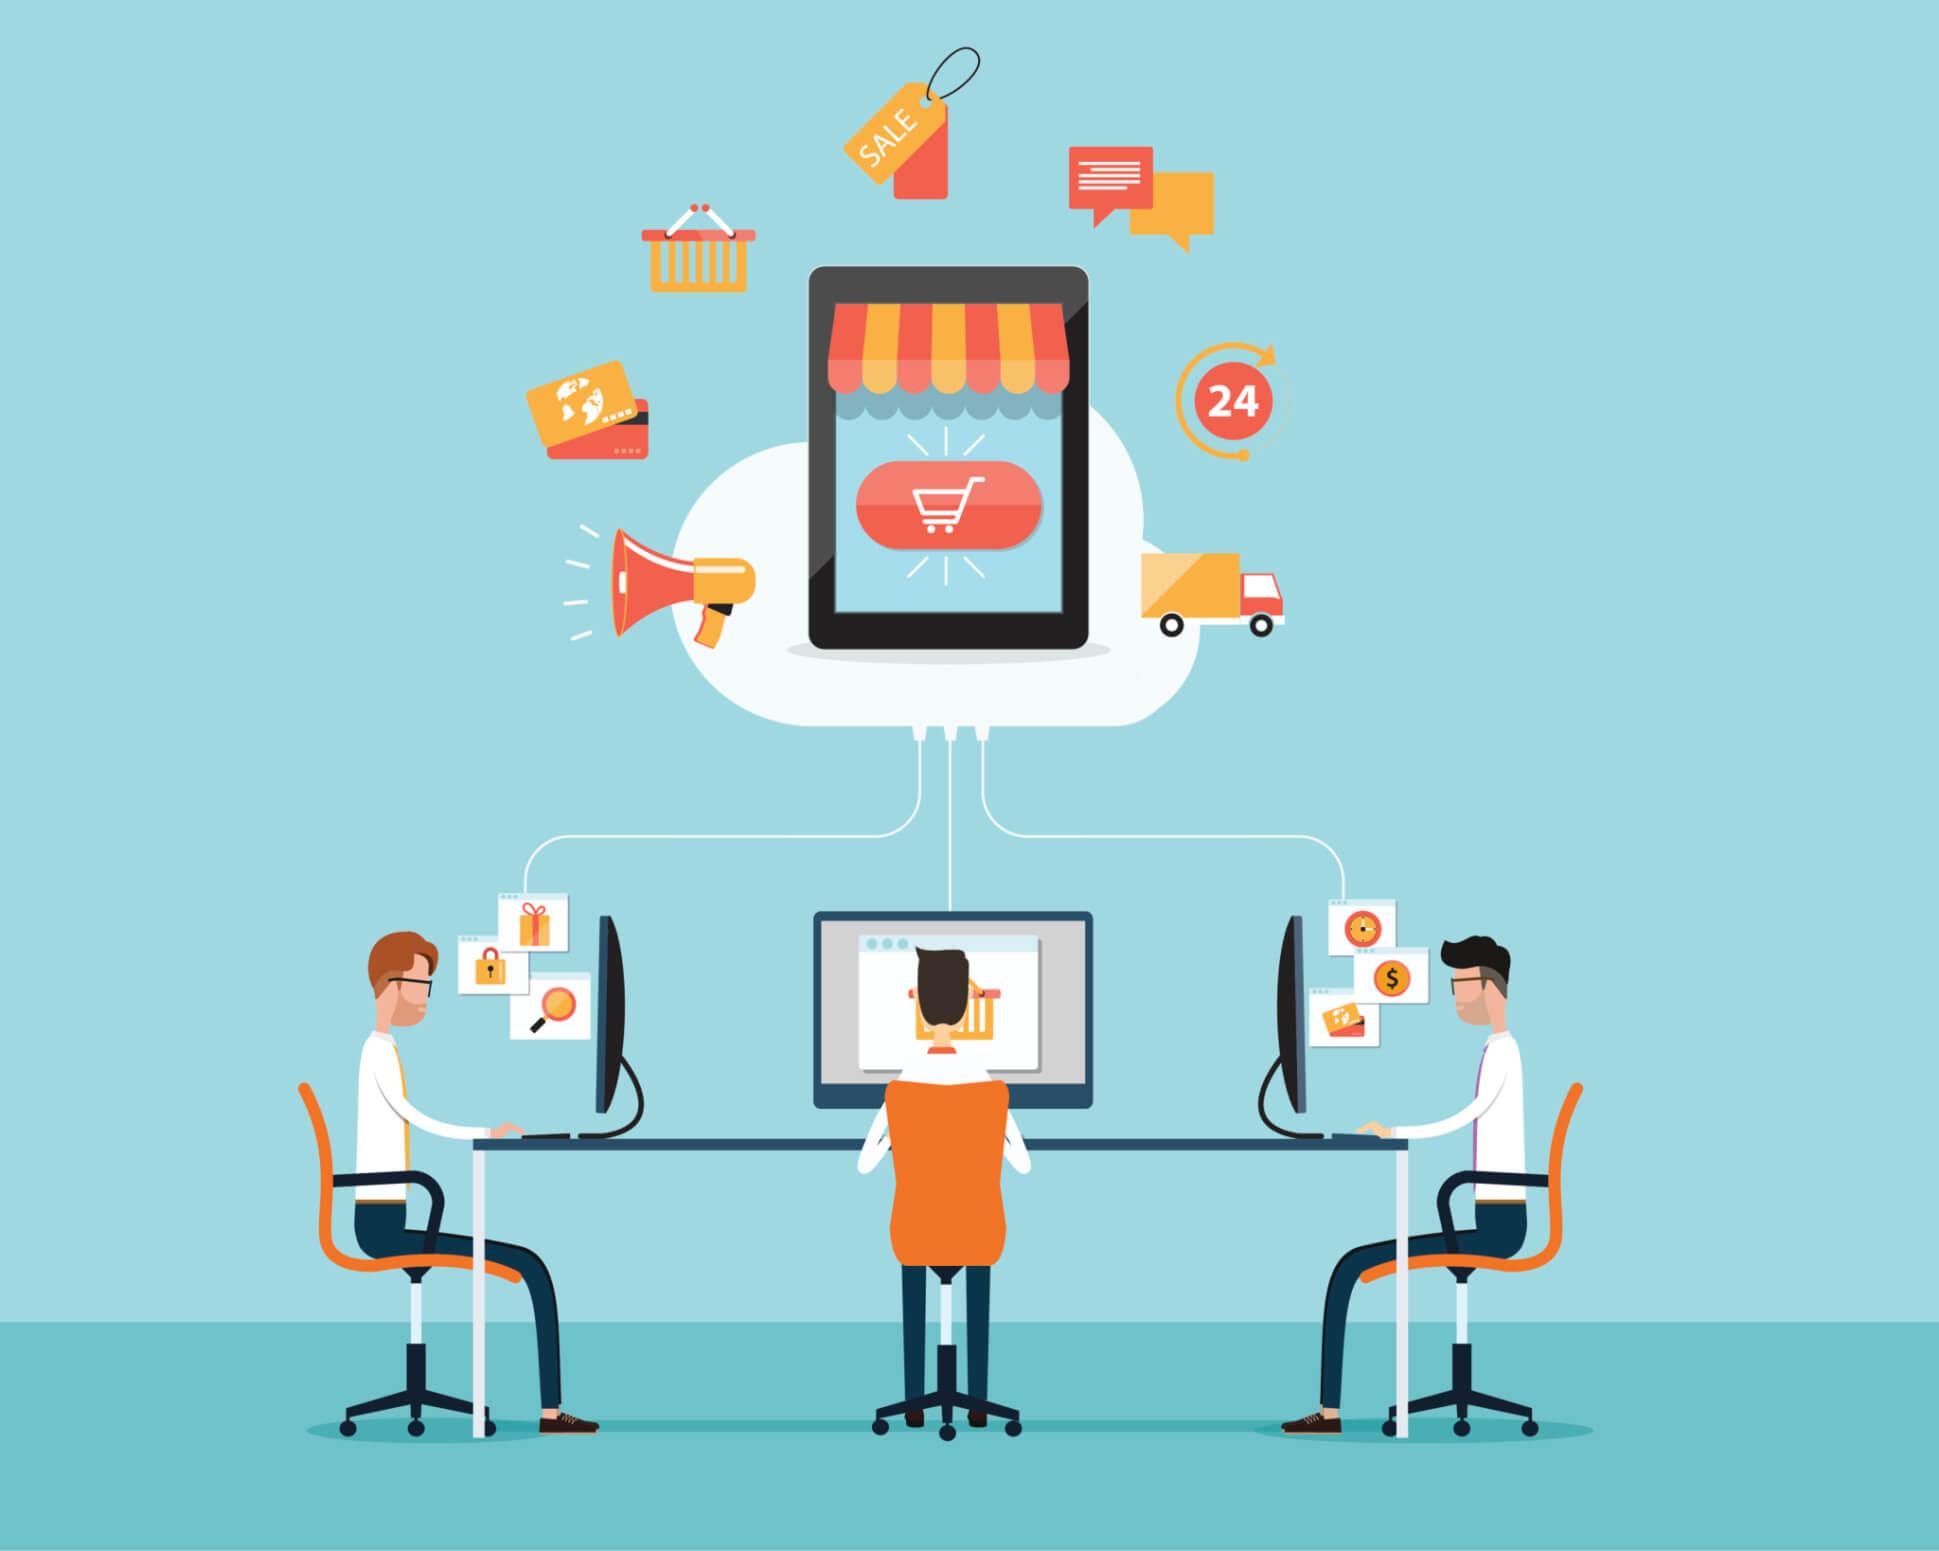 online-business - ایران کار وب | آموزش کسب و کار اینترنتی و کسب ...